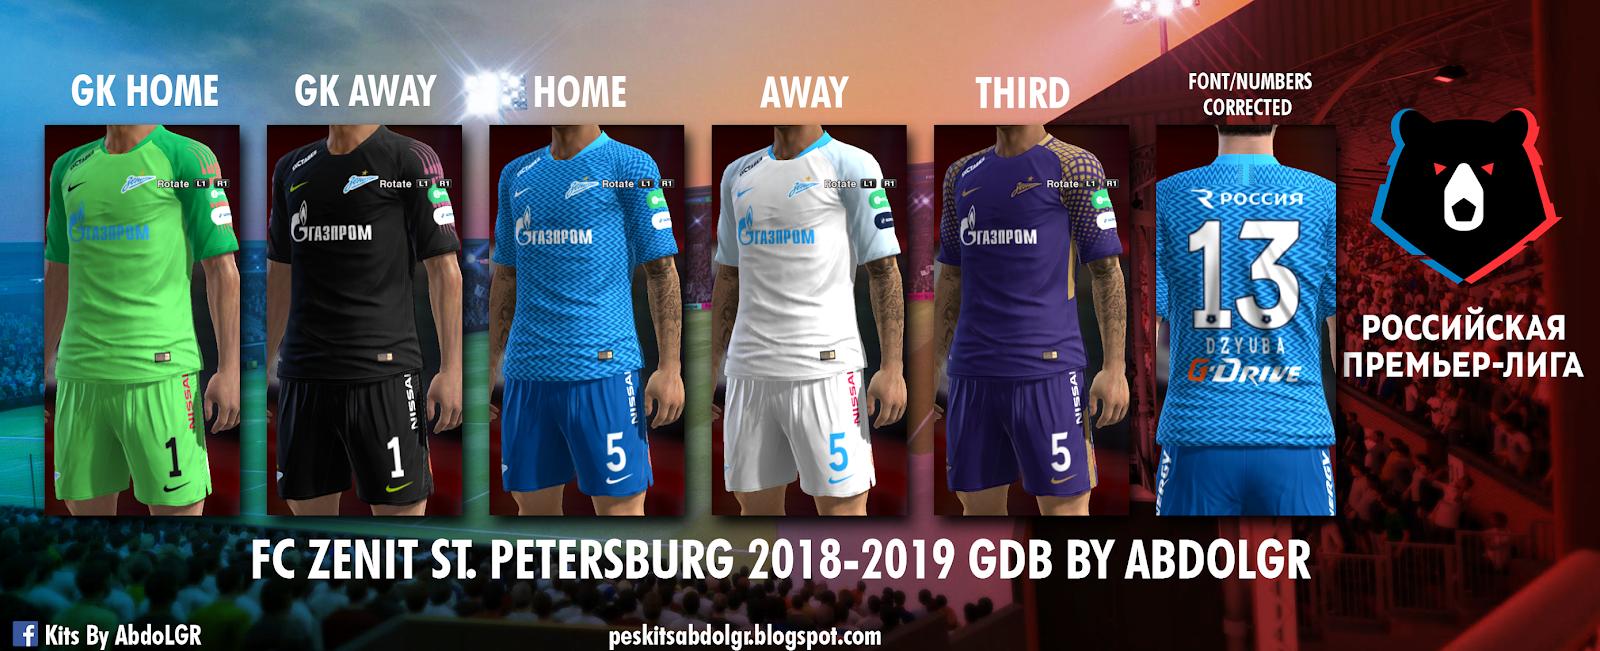 PES 2013 FC Zenit St. Petersburg 2018-2019 GDB by AbdoLGR